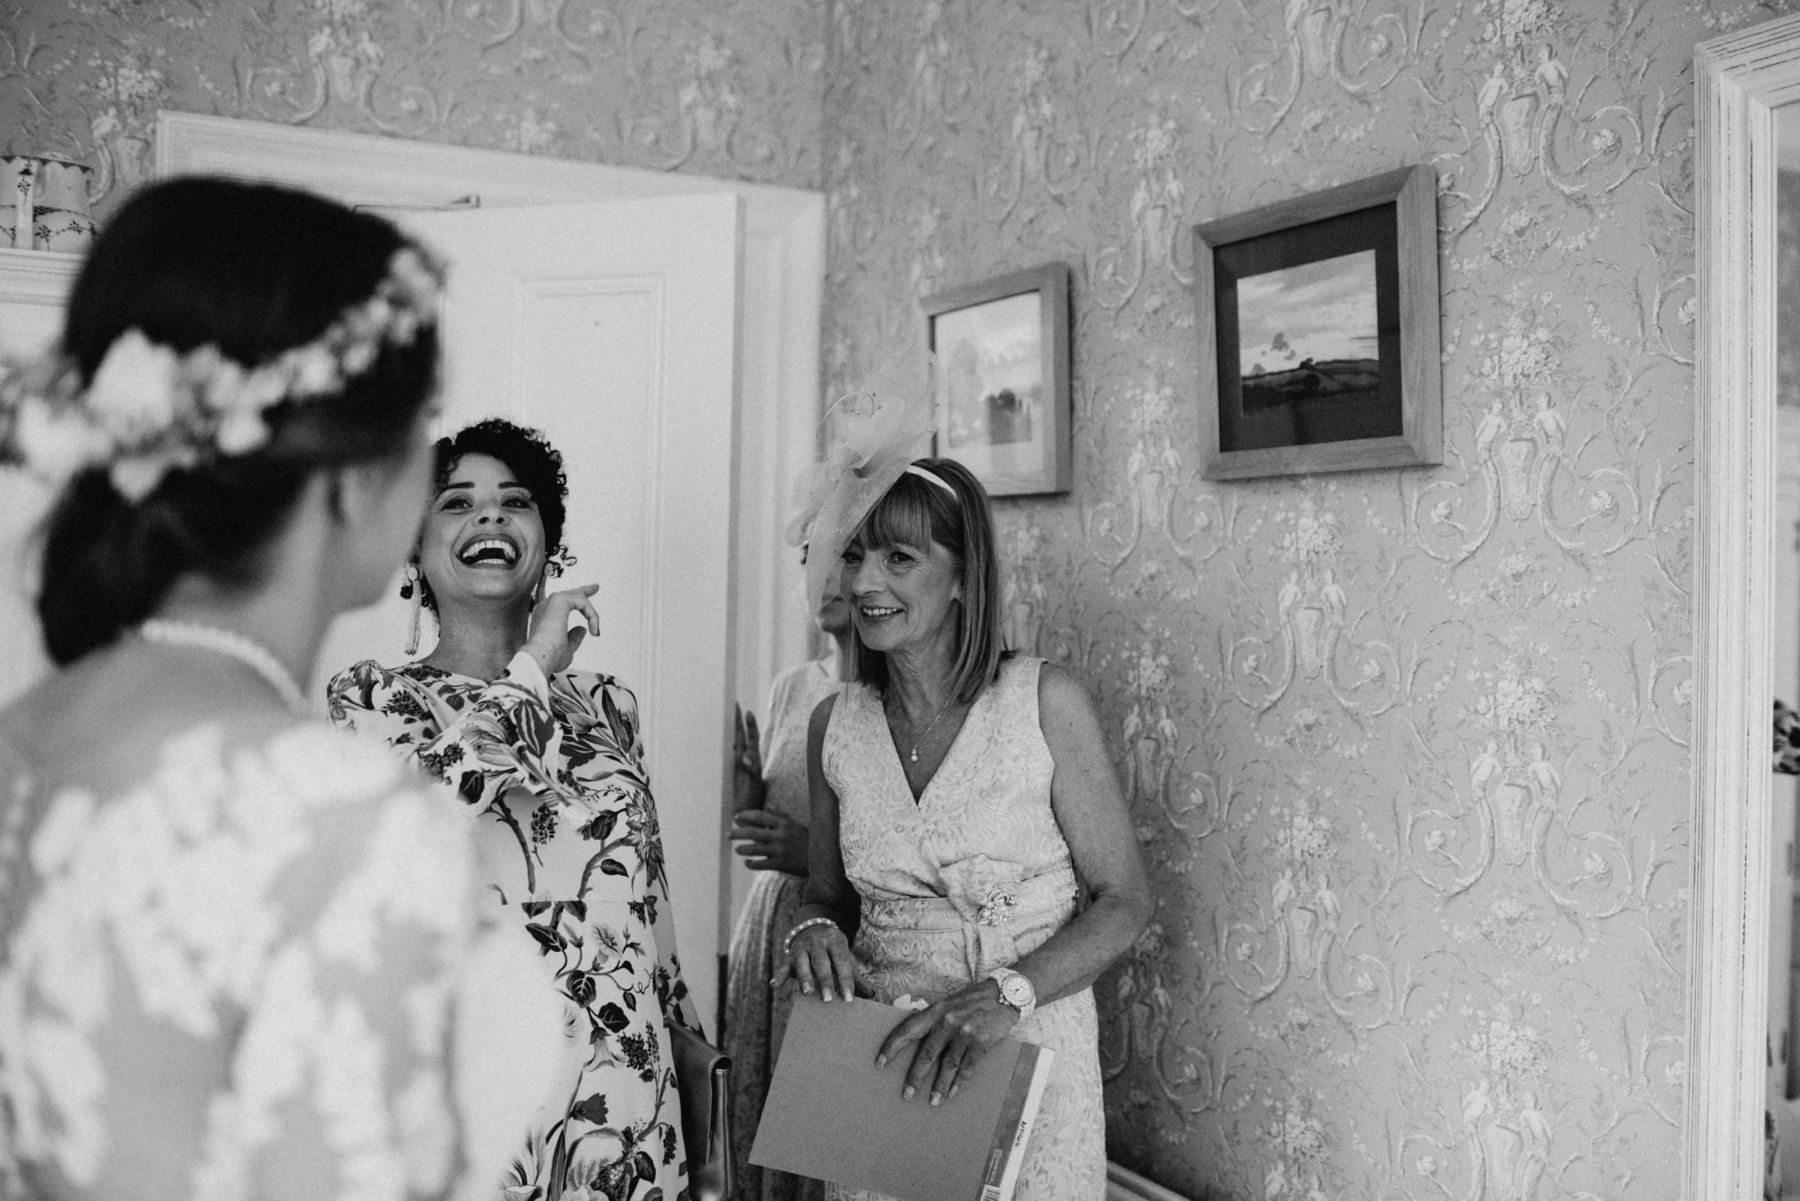 glenmore manor wedding photography